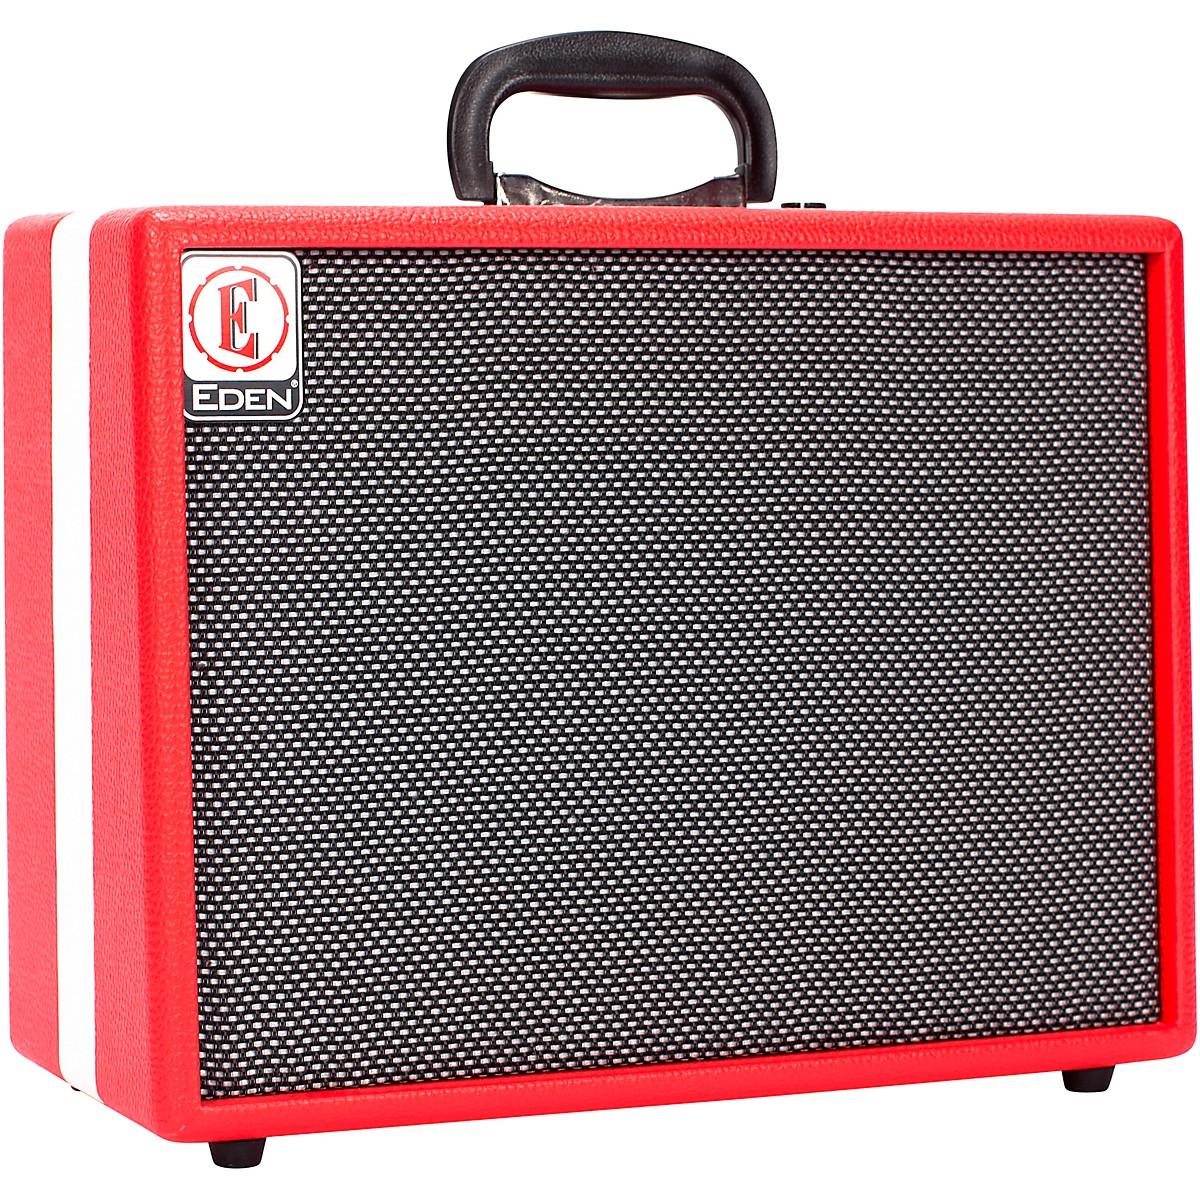 Eden E-Uke 20W Ukulele Combo Amplifier